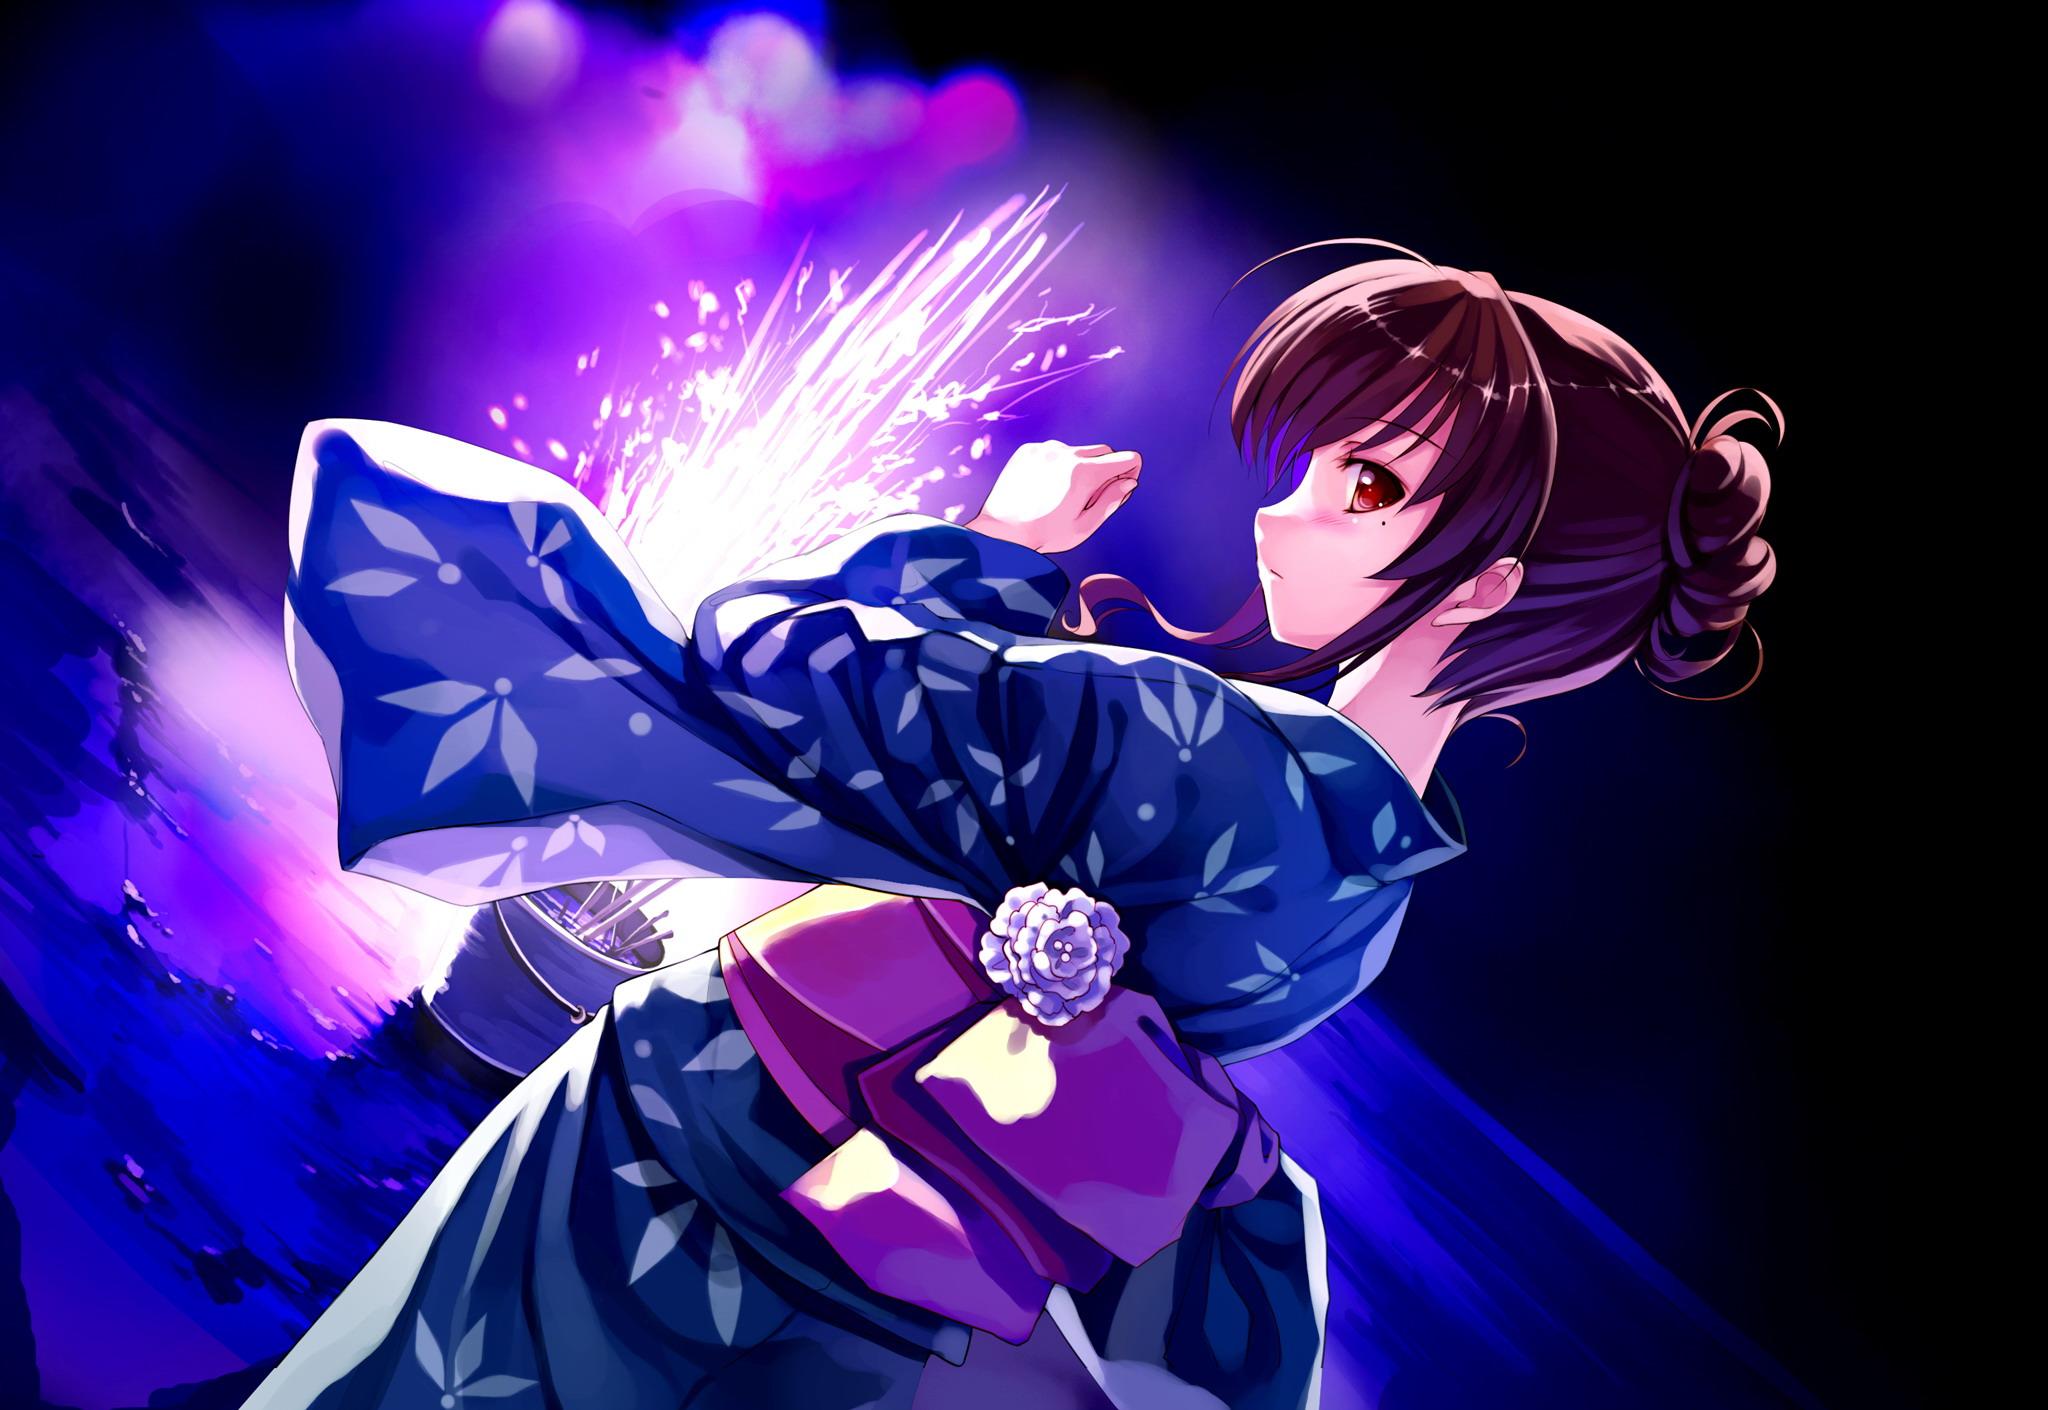 Deep Blue Sky Pure White Wings Wallpaper Hd Anime Girl